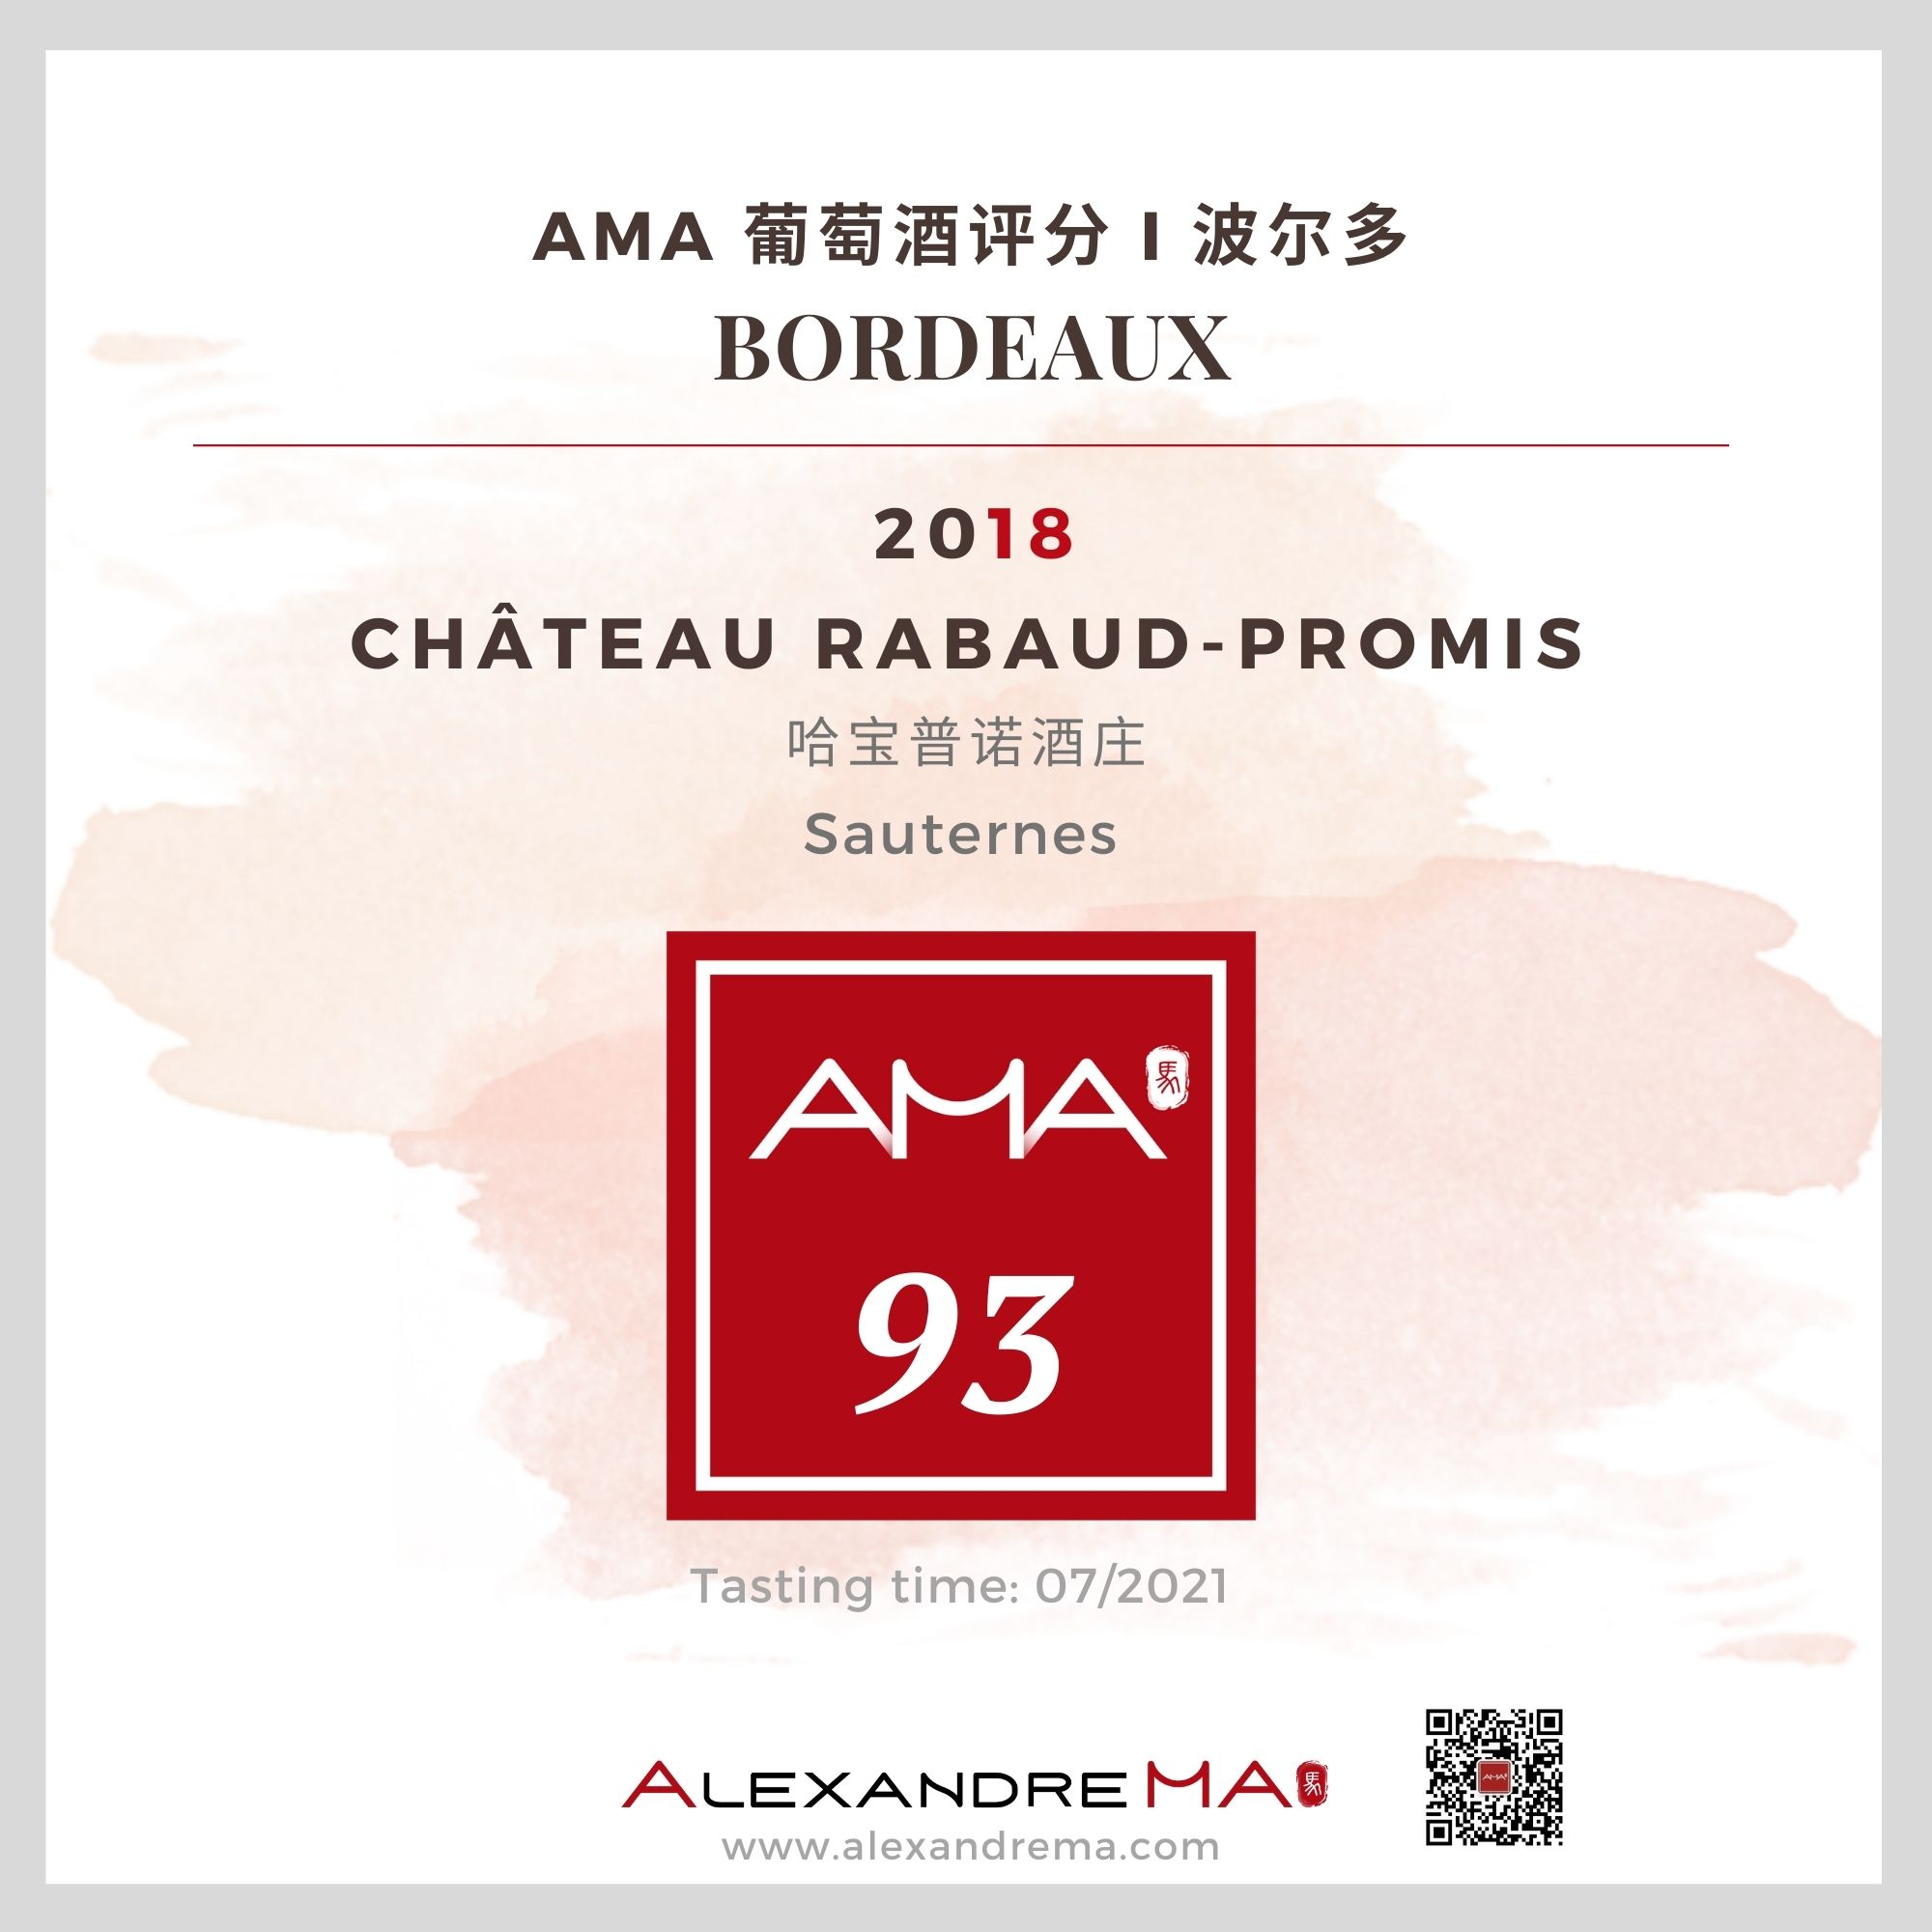 Château Rabaud-Pomis 2018 哈宝普诺酒庄 - Alexandre Ma